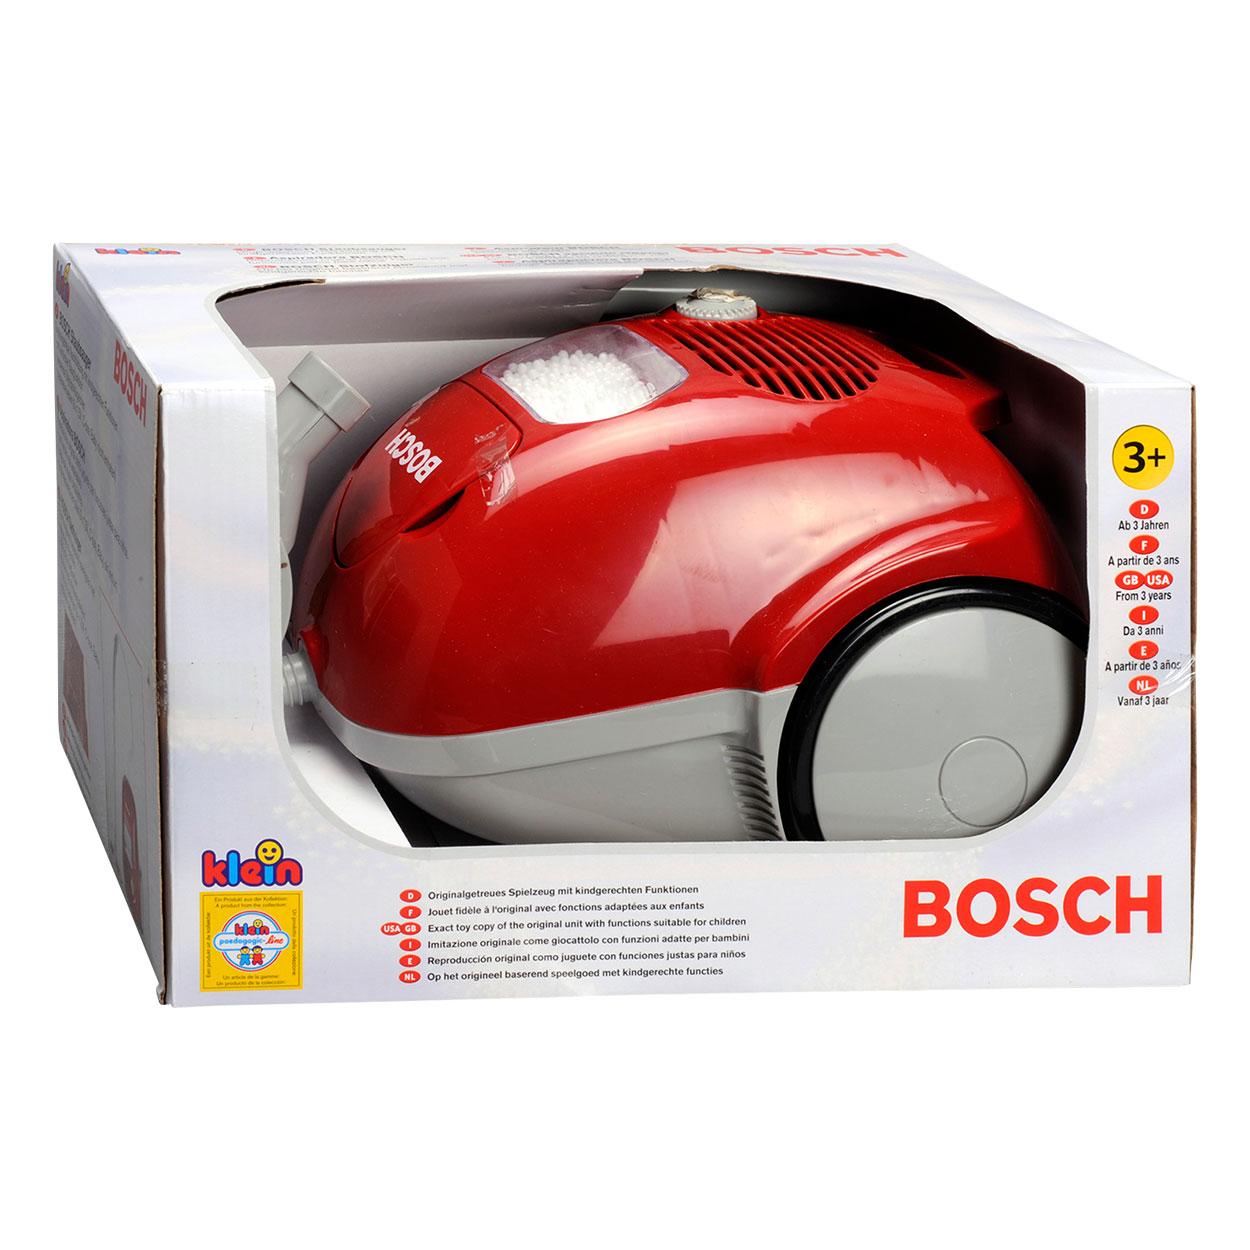 Bosch Stofzuiger online kopen   Lobbes nl